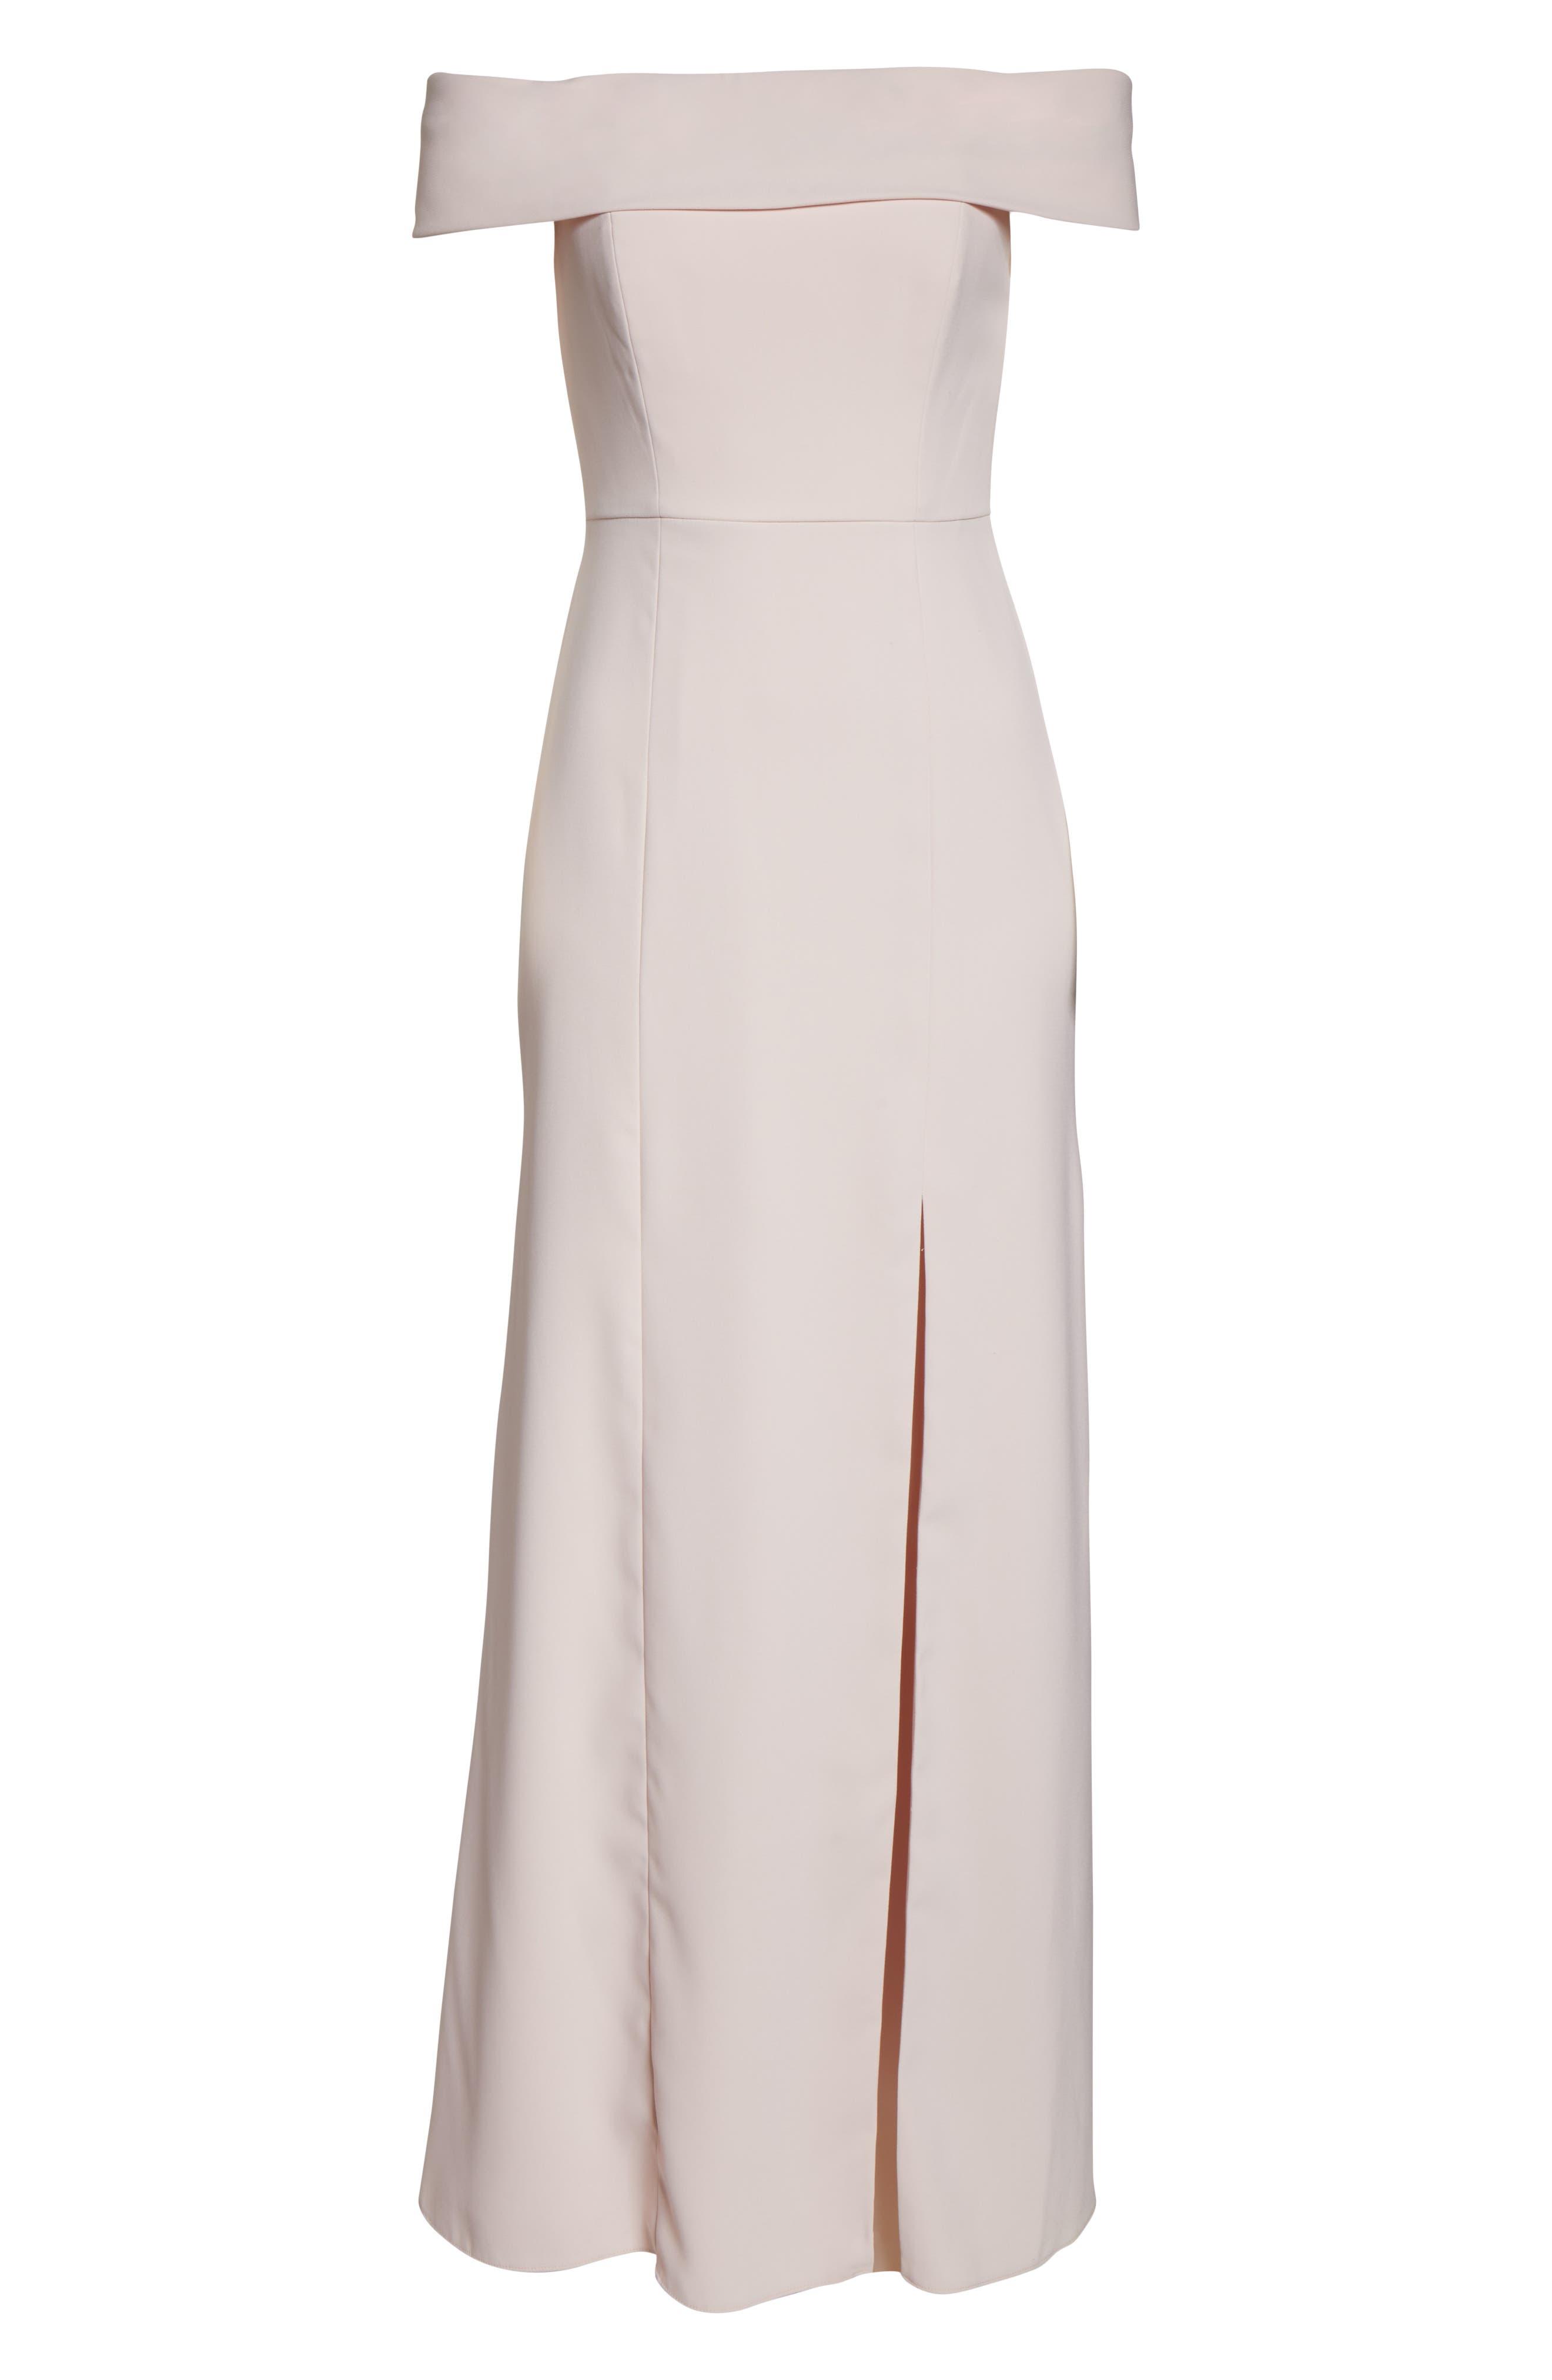 DESSY COLLECTION, Off the Shoulder Side Slit Crepe Gown, Alternate thumbnail 3, color, BLUSH